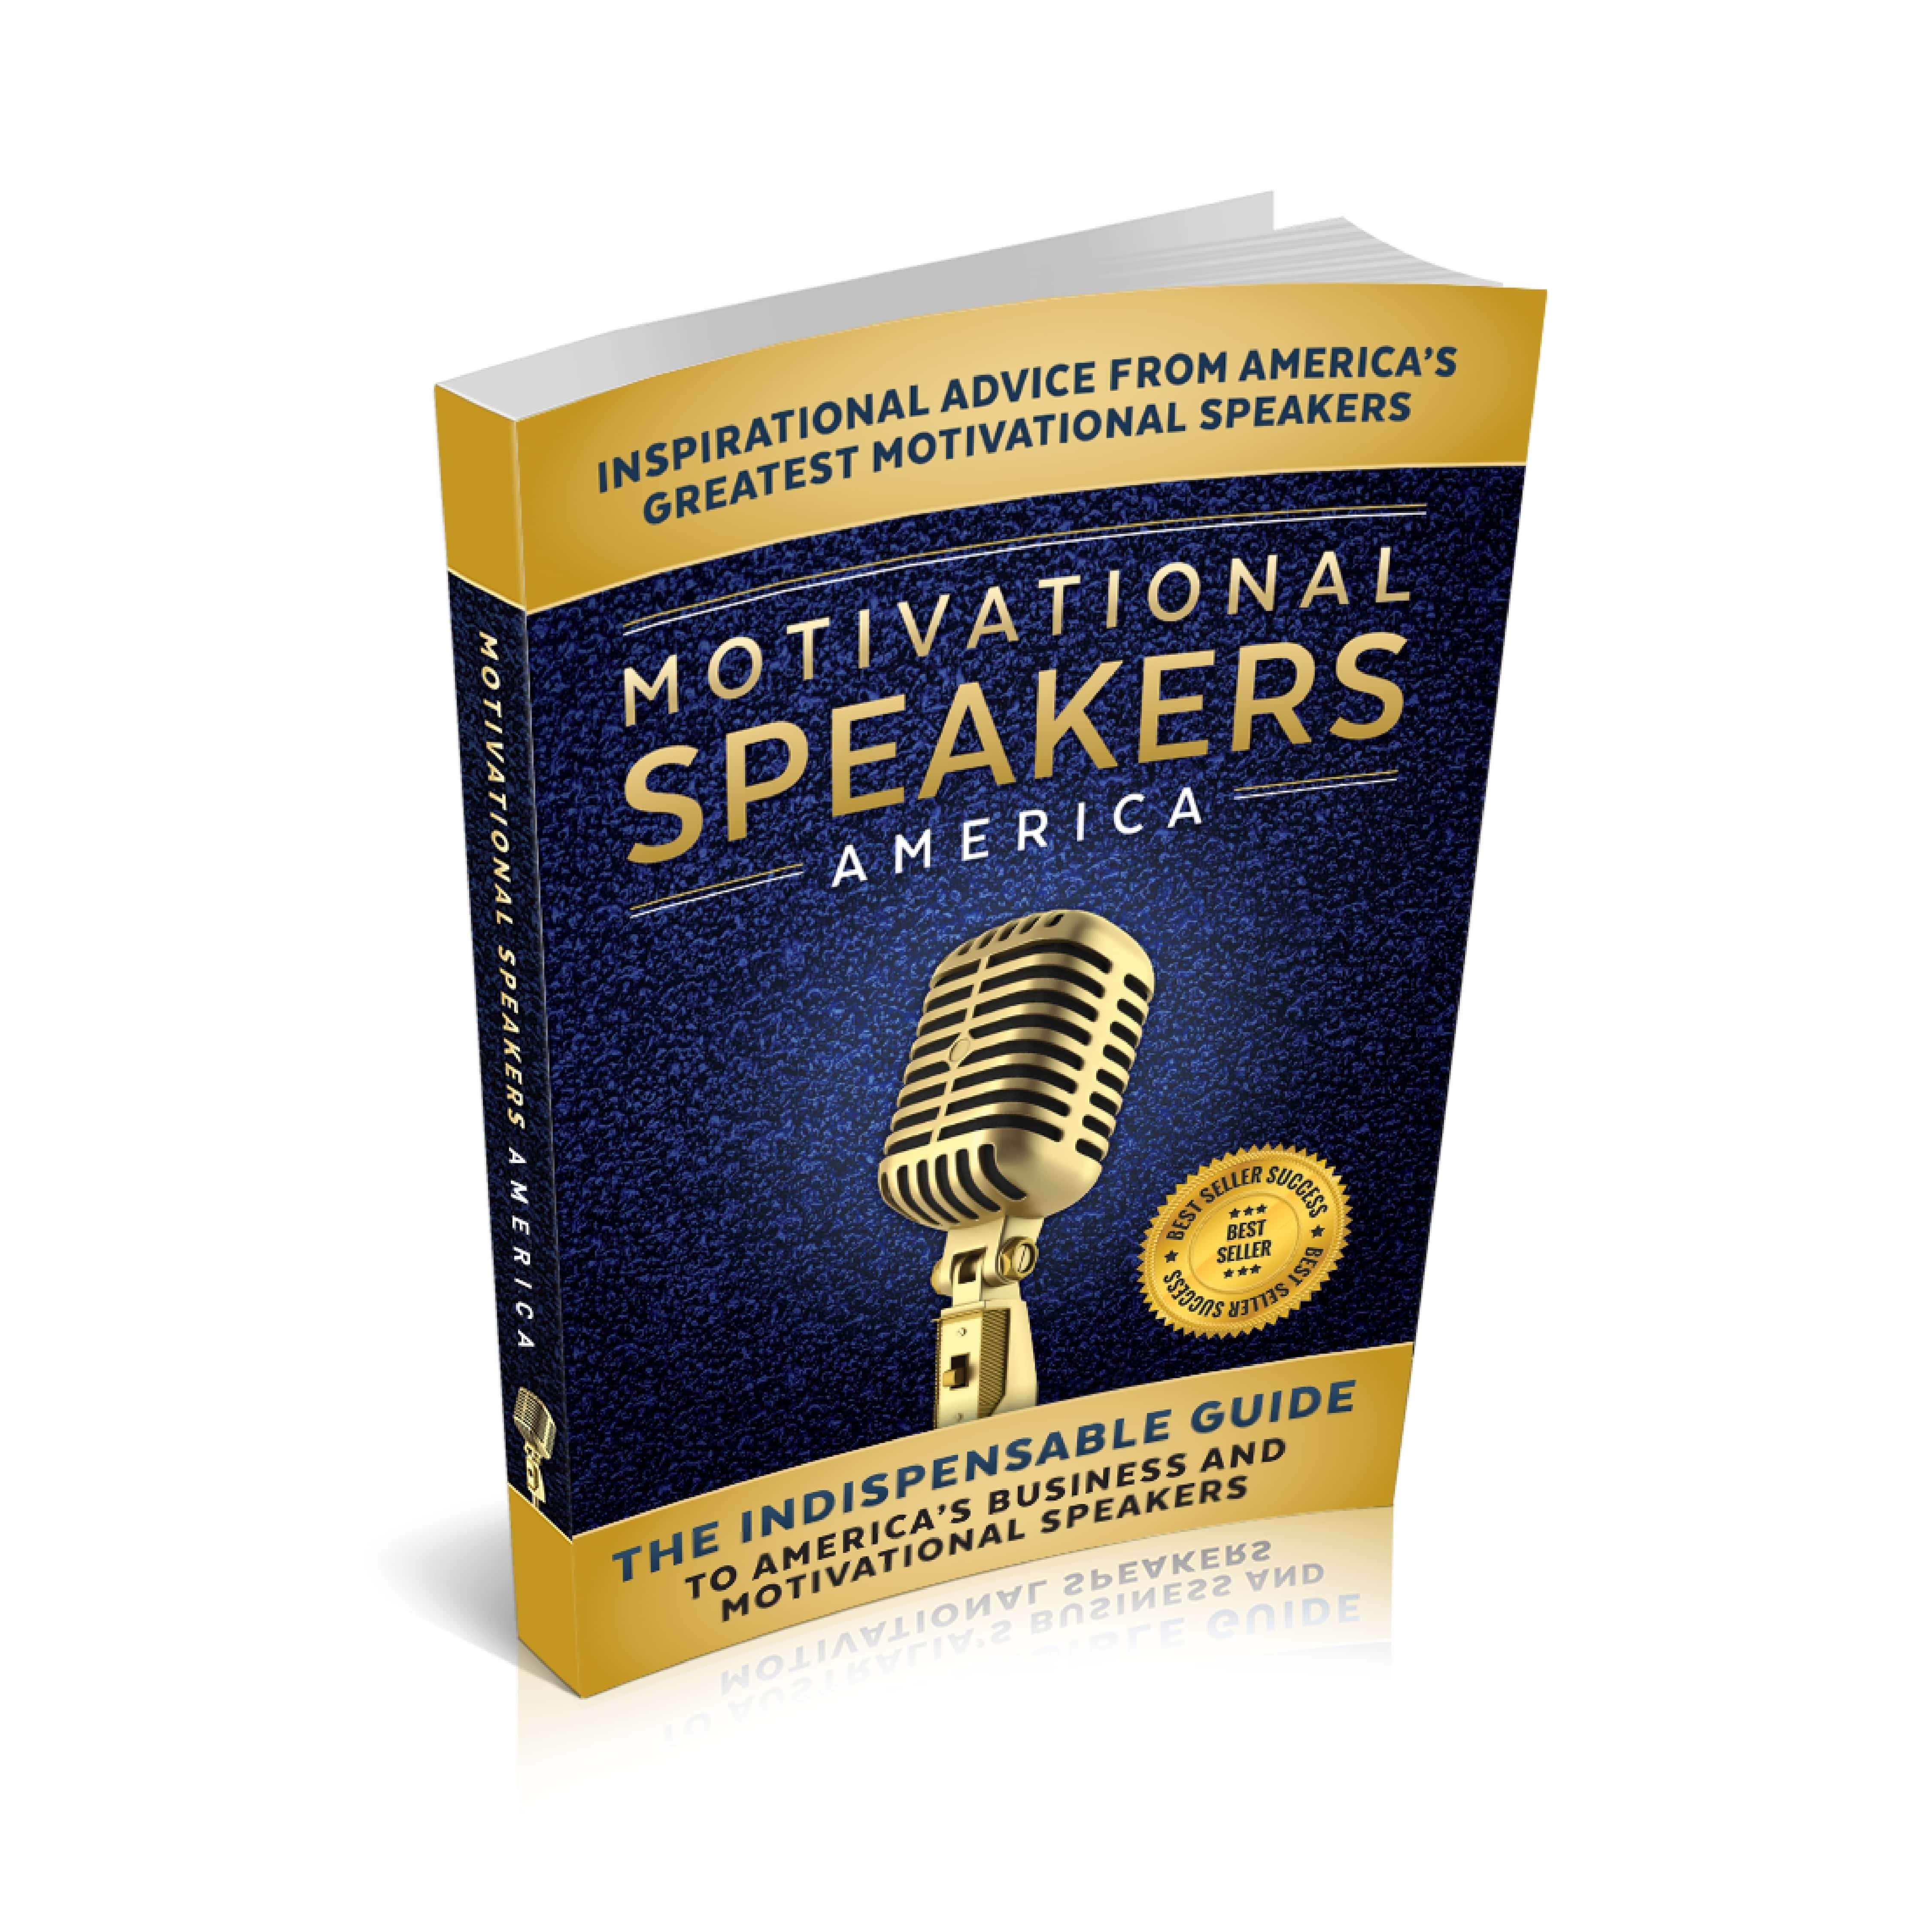 Motivational Speakers America book by Cydney O'Sullivan